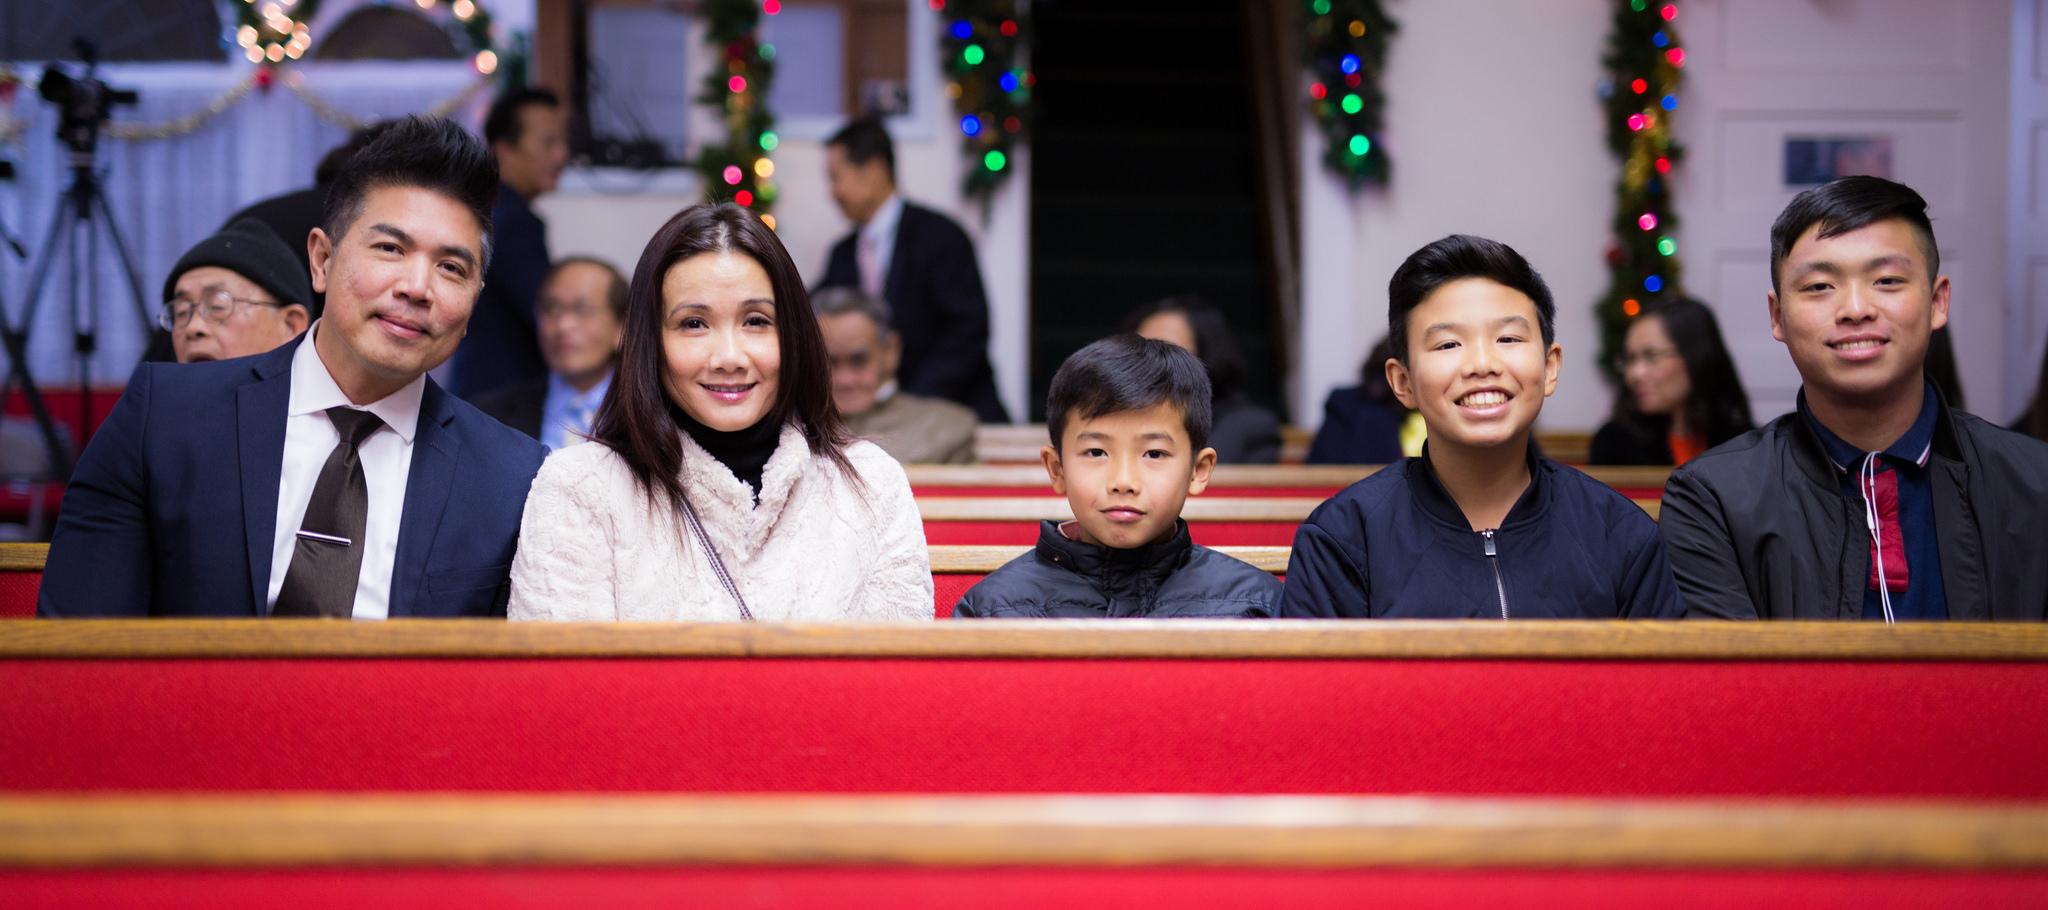 Christmas Eve Celebration 2016